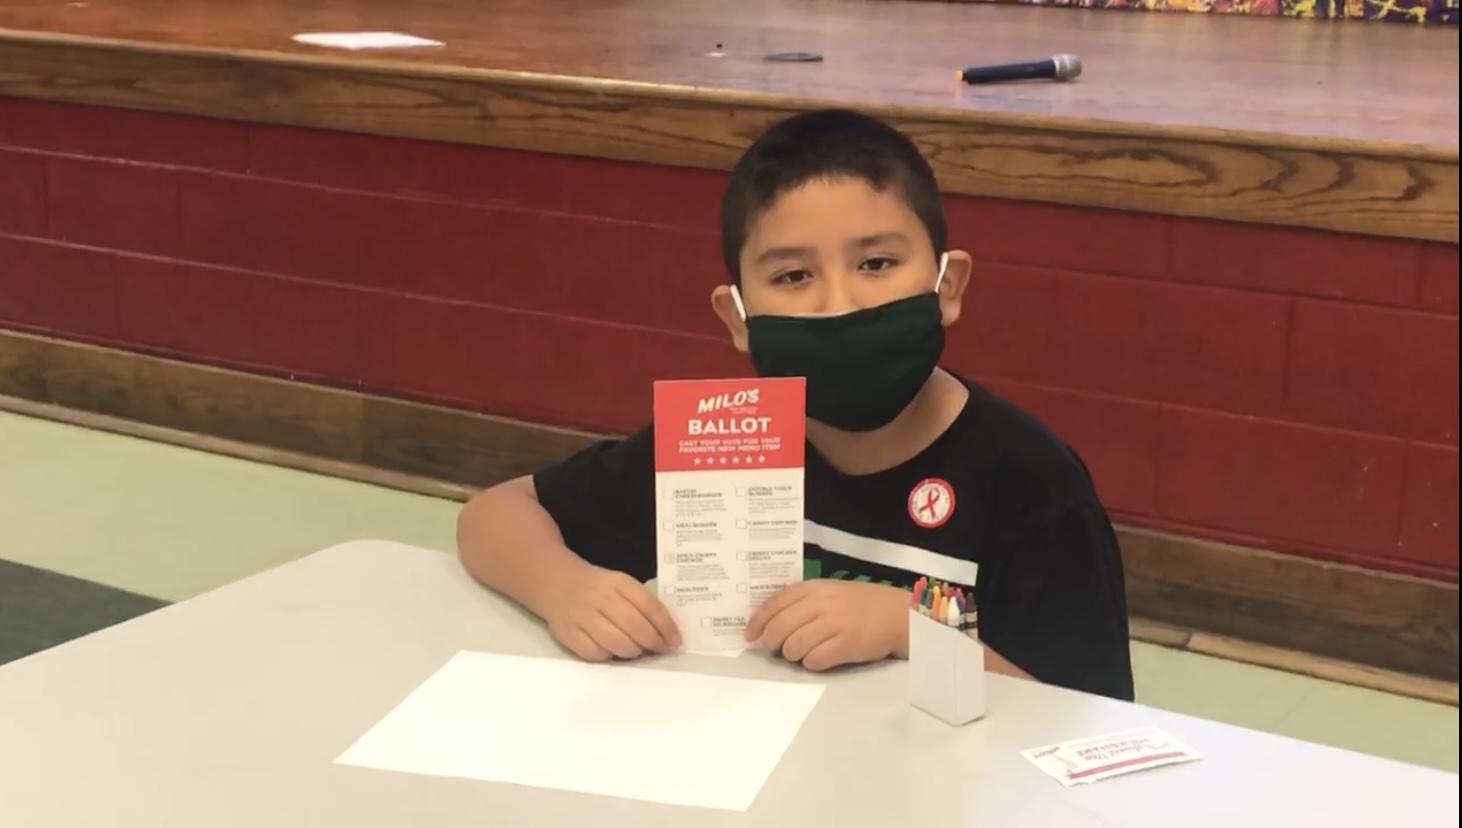 child with milo's ballot